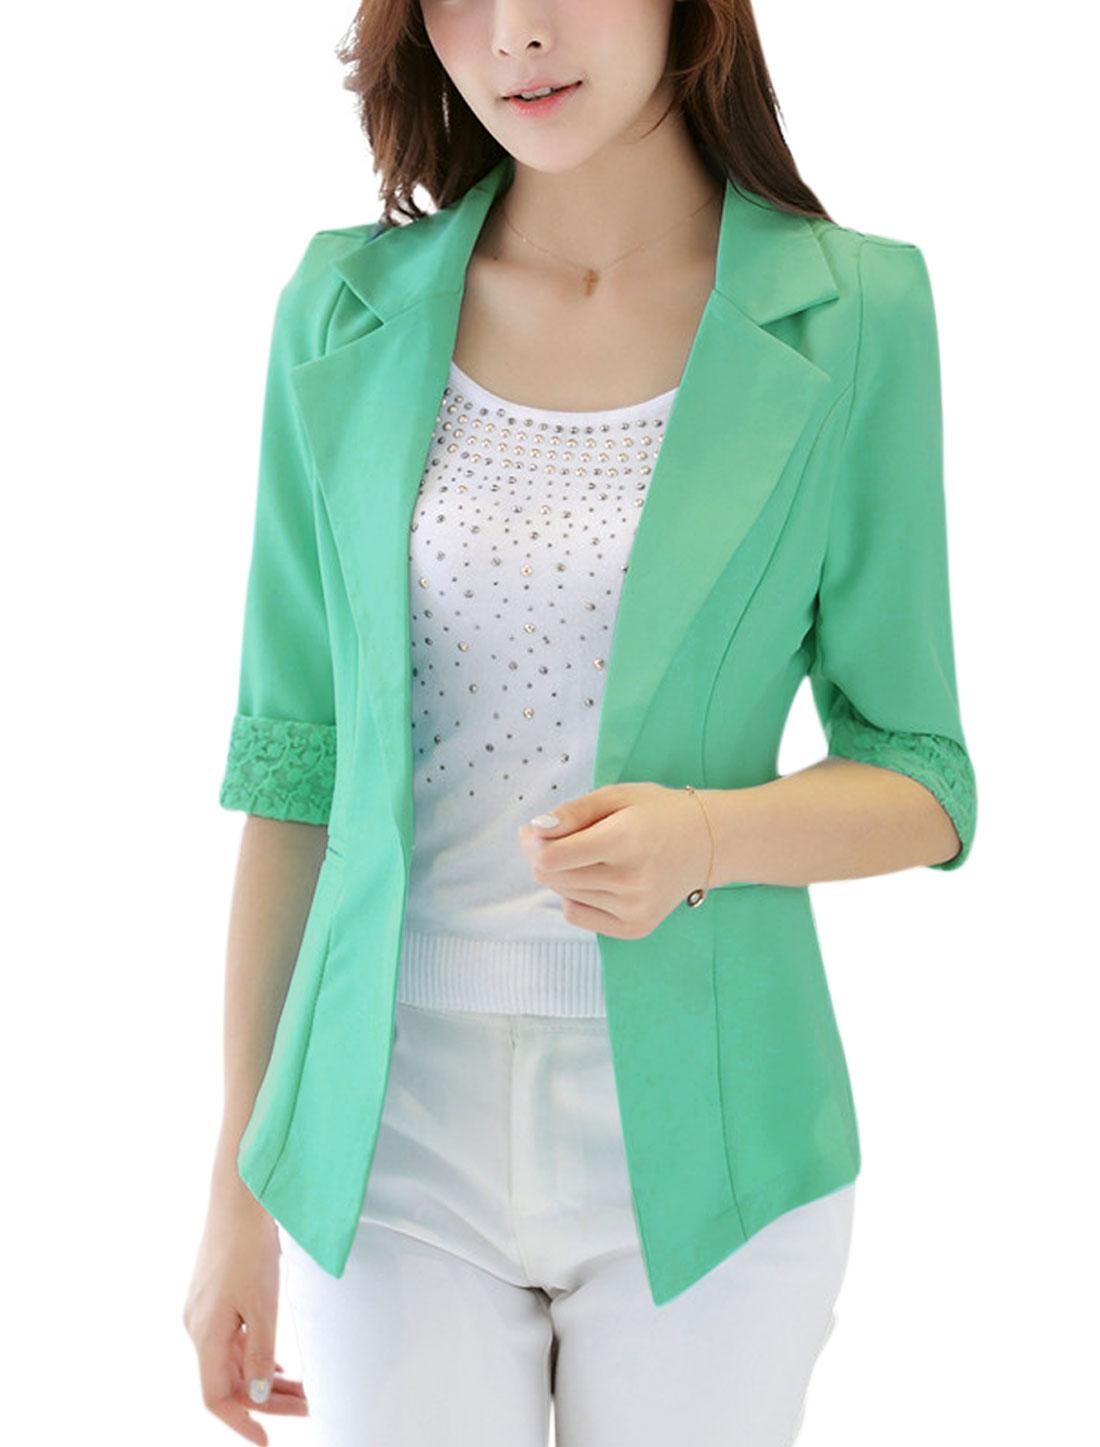 Roll Up Cuffs Half Sleeves Slim Fit Light Green Blazer Jacket for Ladies M